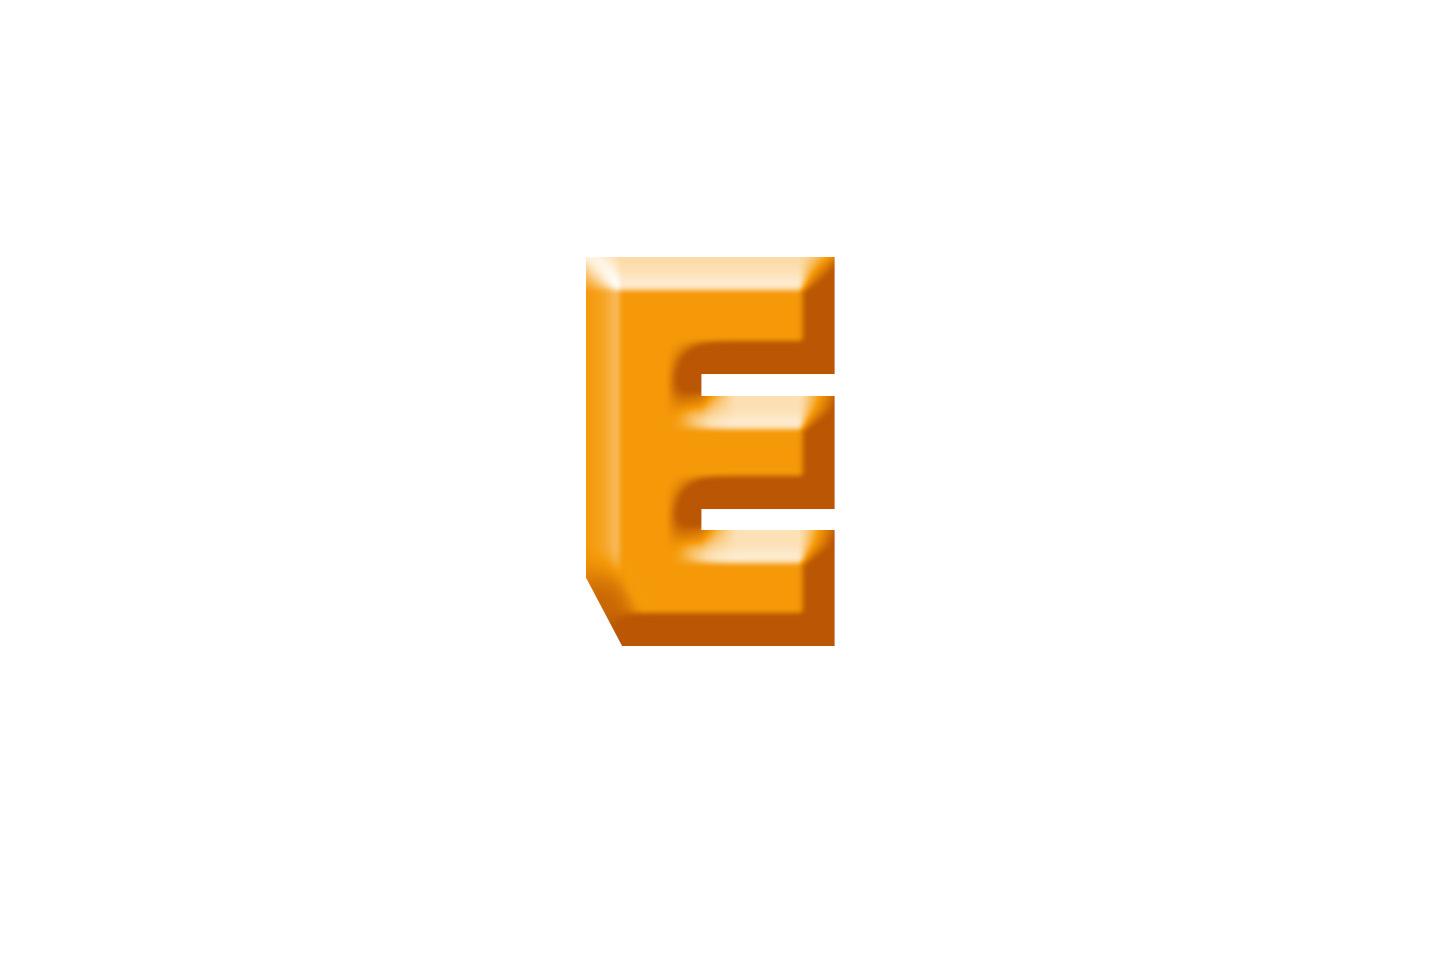 e�kiڎJt_如何制作字母e